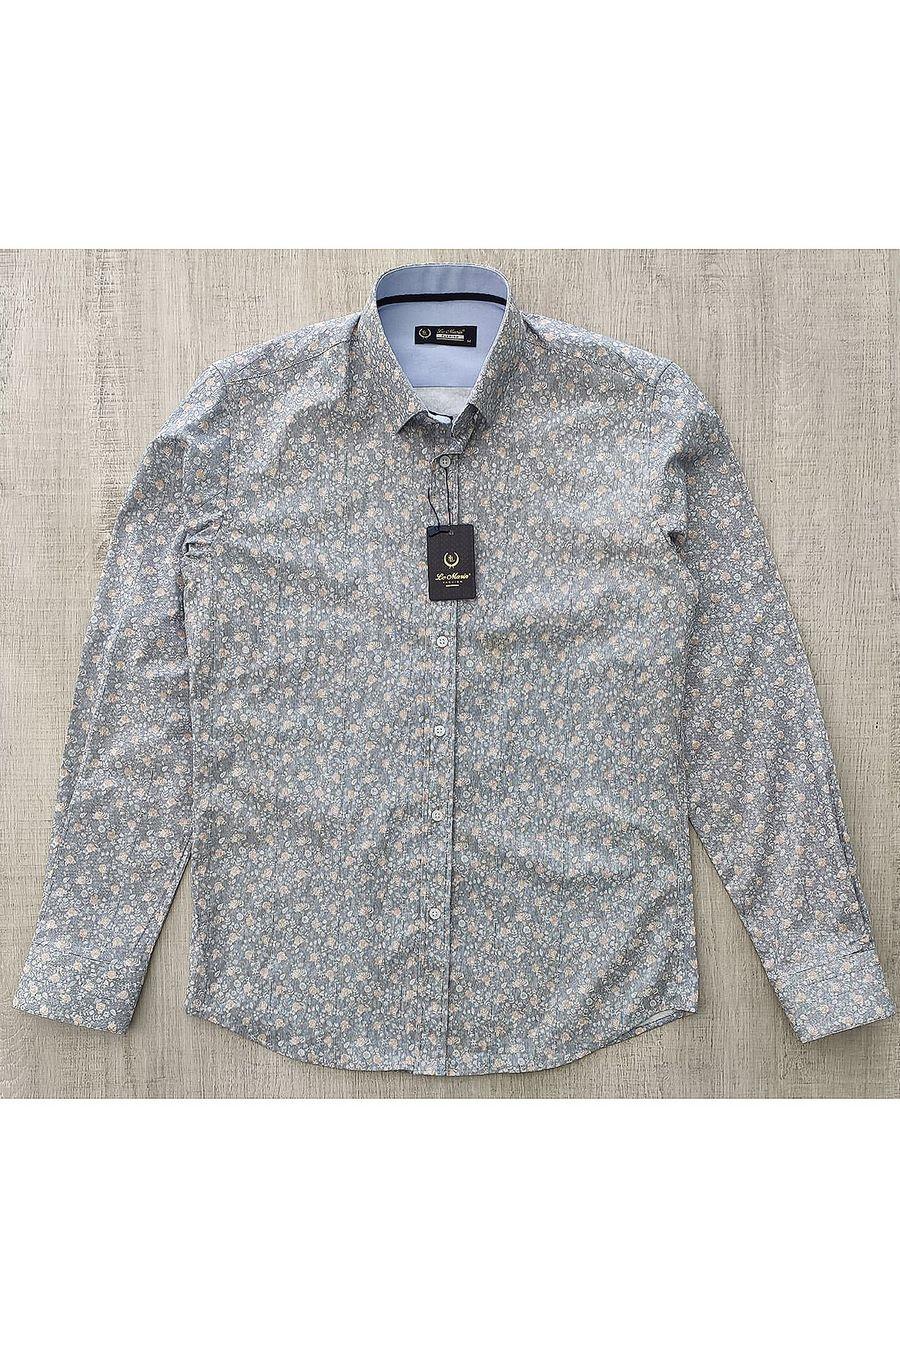 Рубашка мужская Le Marin 400 - фото 1